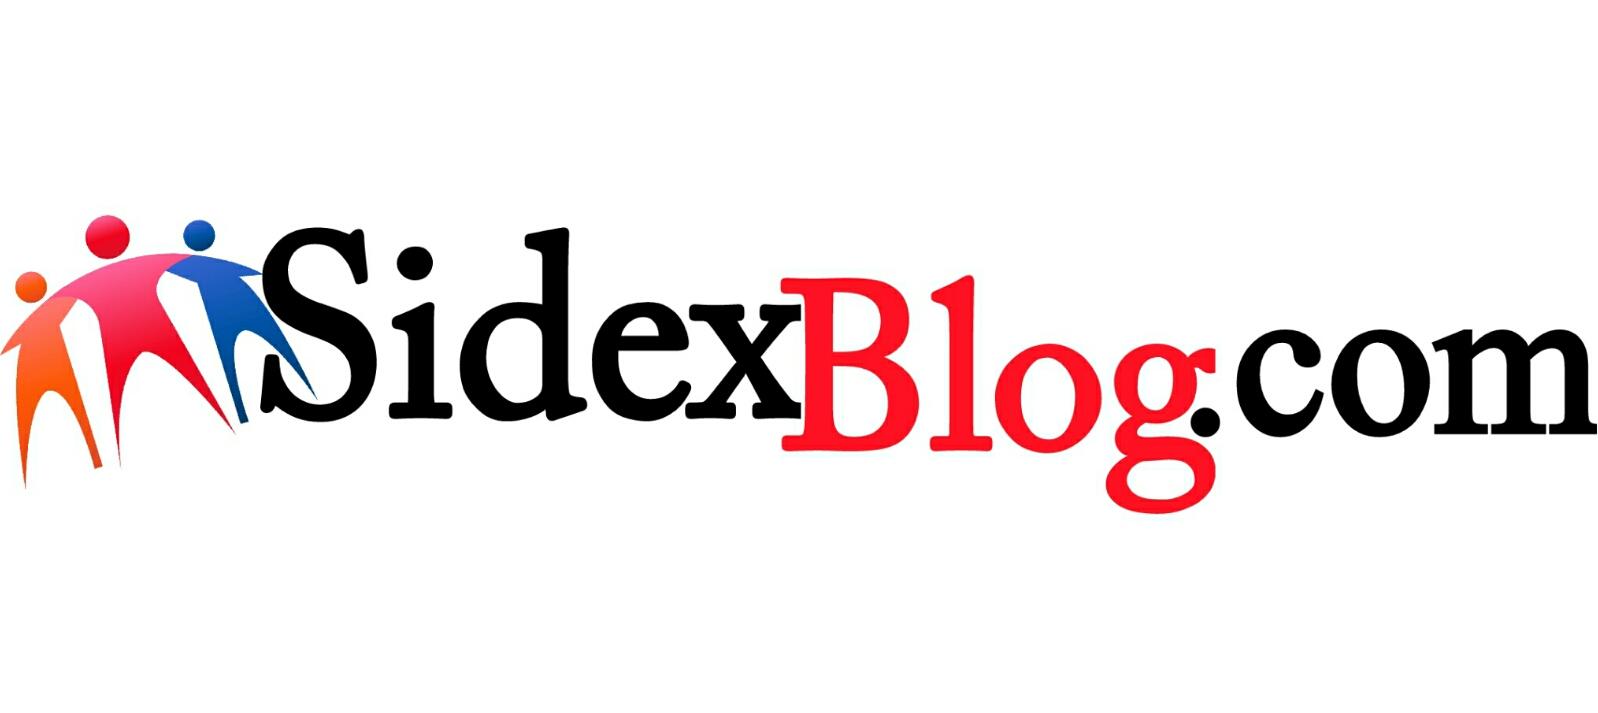 Sidexblog    Business ideas, bitcoin investment, wealth creation, bitcoin price, make money online